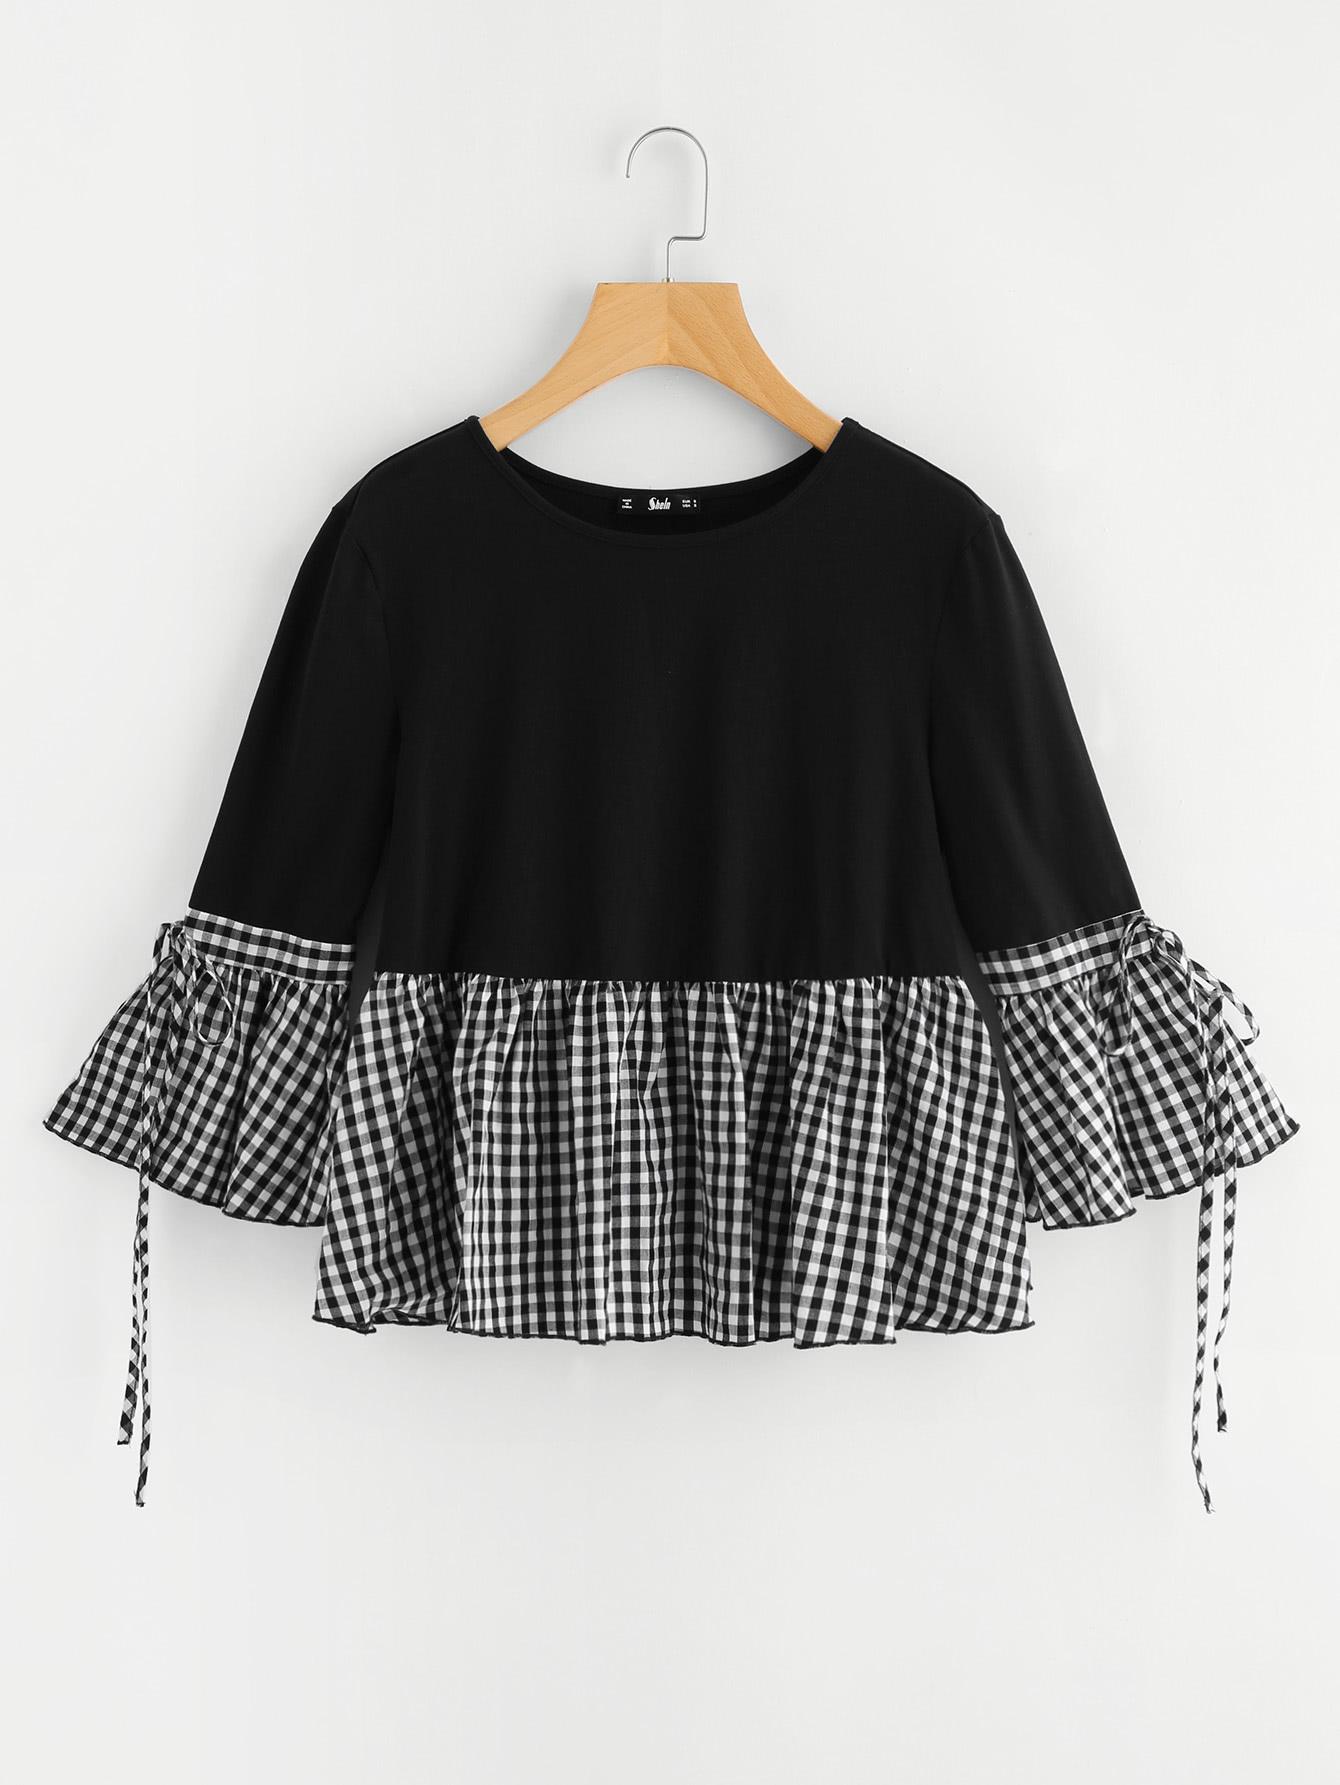 Gingham Flounce Trim Bell Sleeve Tee drop shoulder flounce trim sleeve sweatshirt